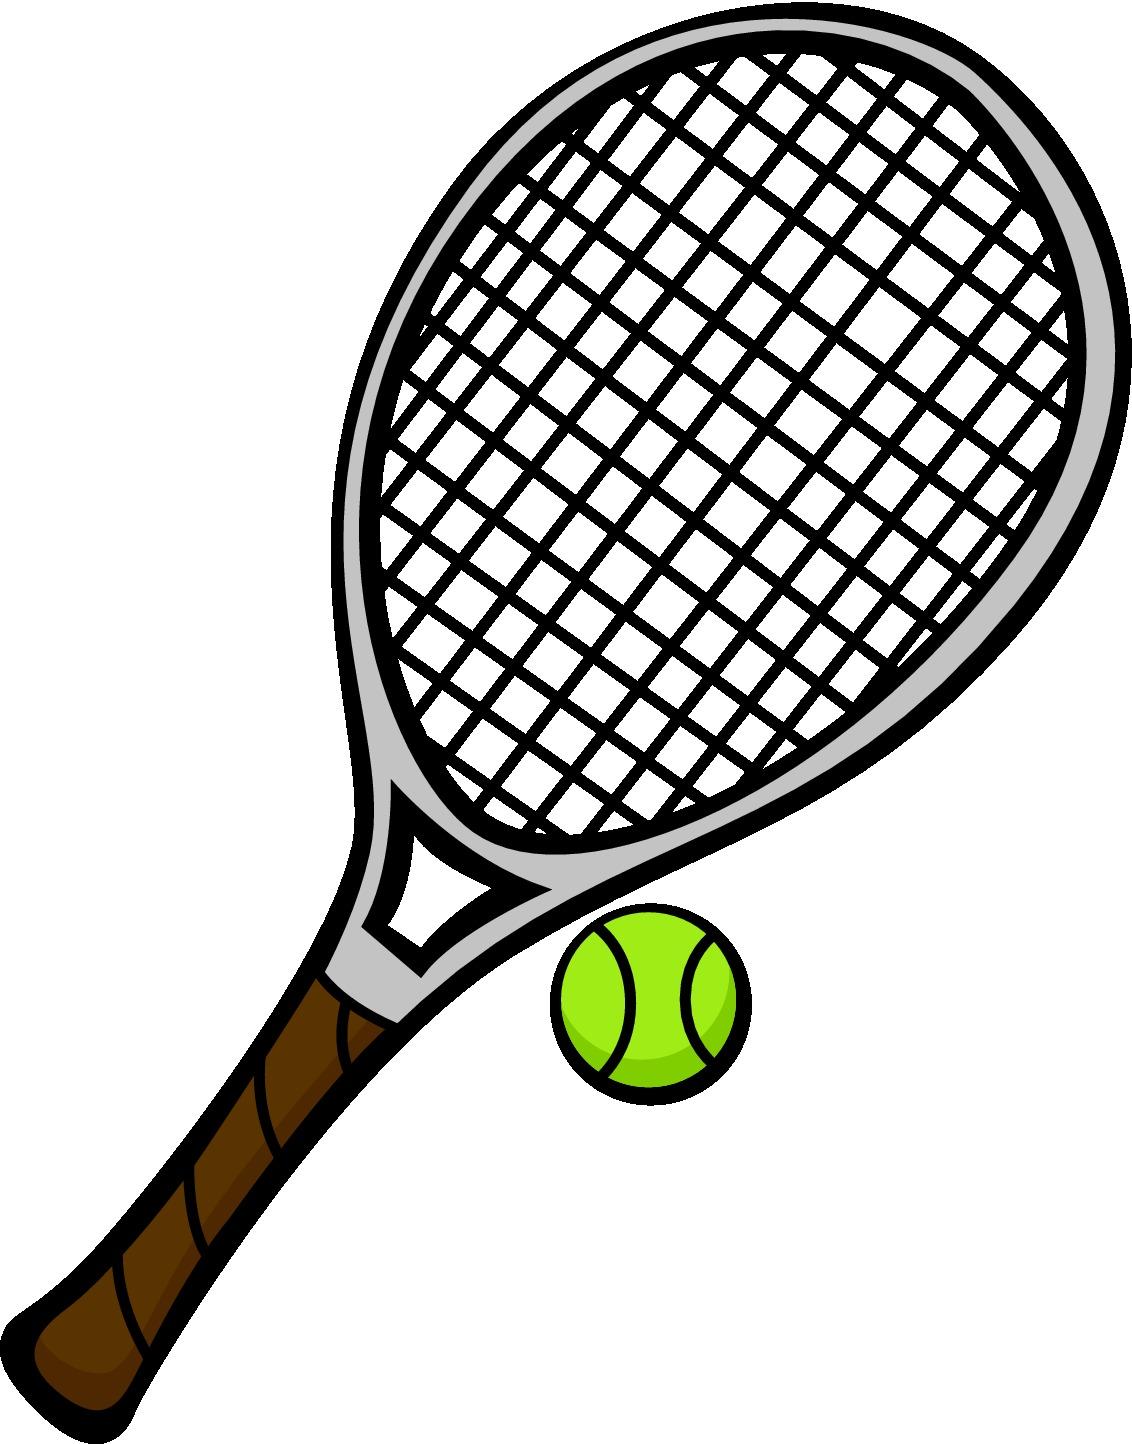 1132x1444 Tennis Drawing Gtgt